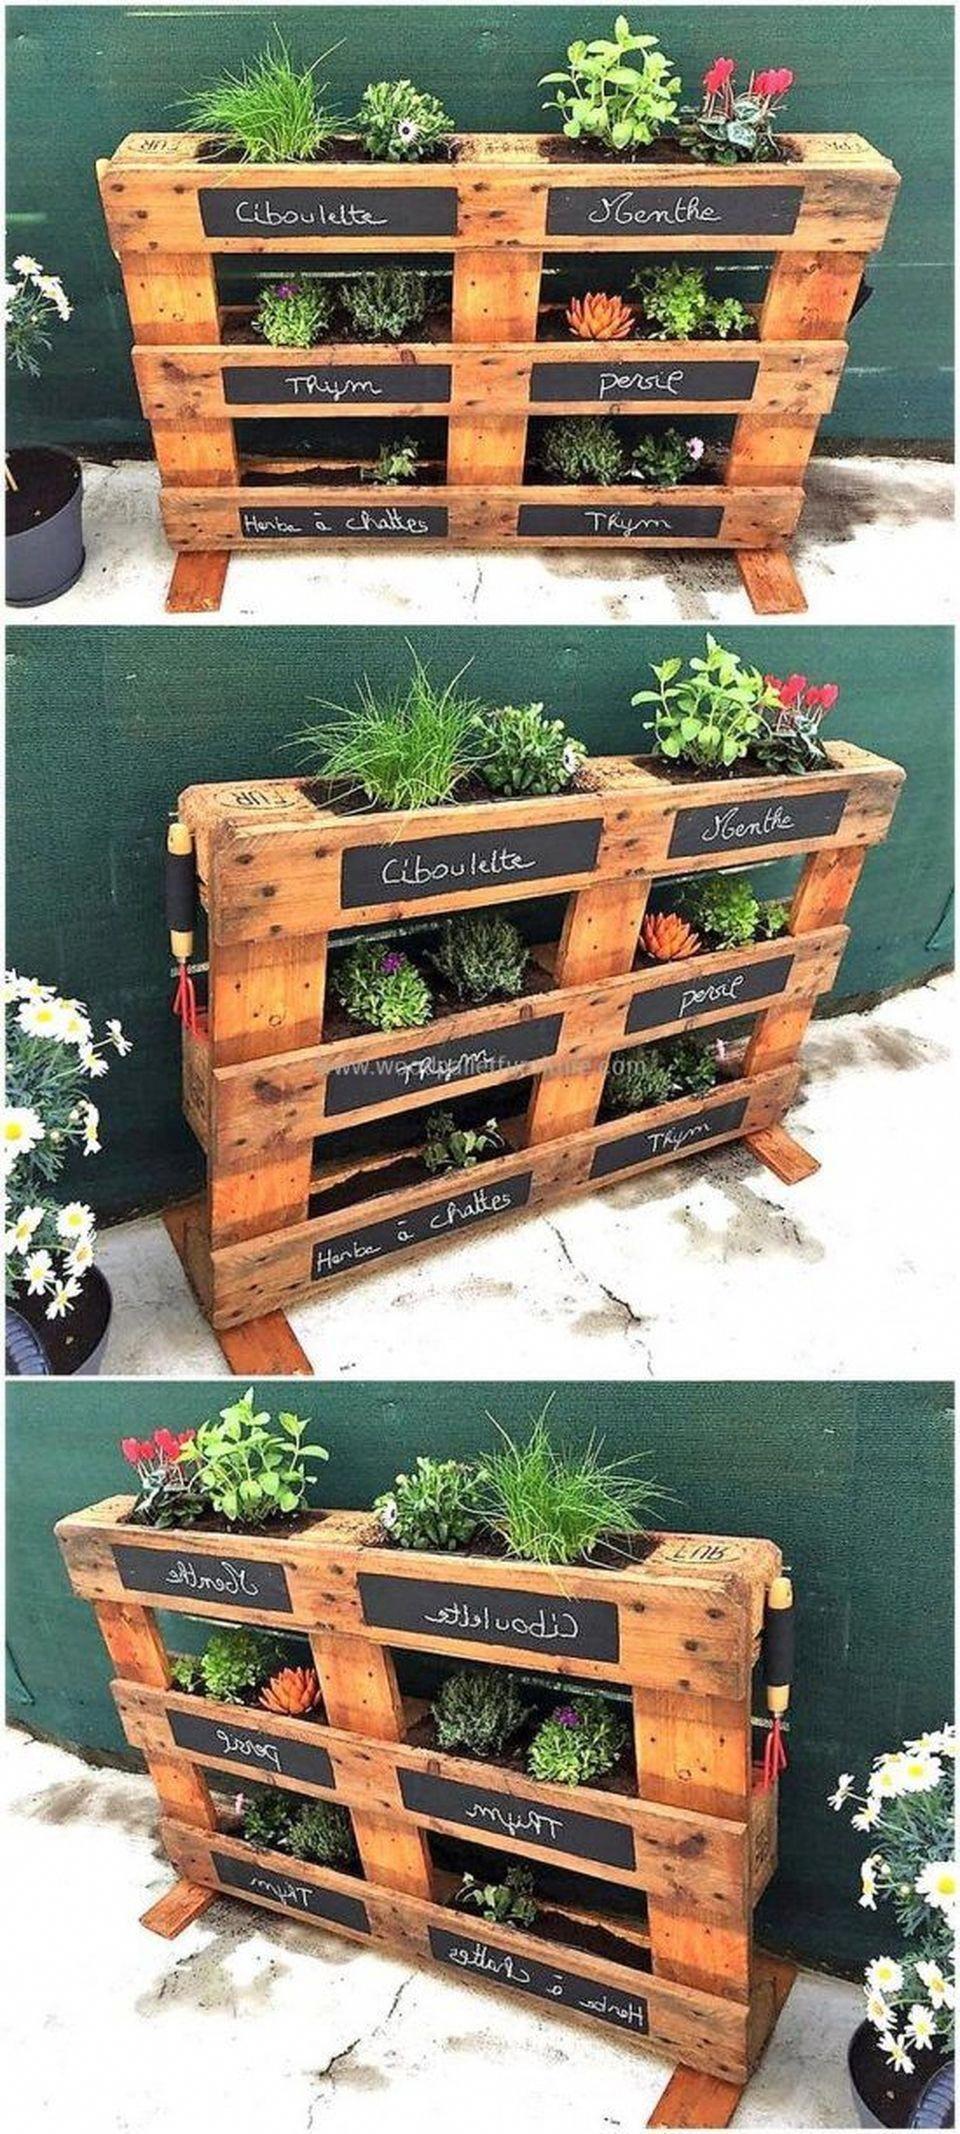 Amazing Creative Wood Pallet Garden Project Ideas #